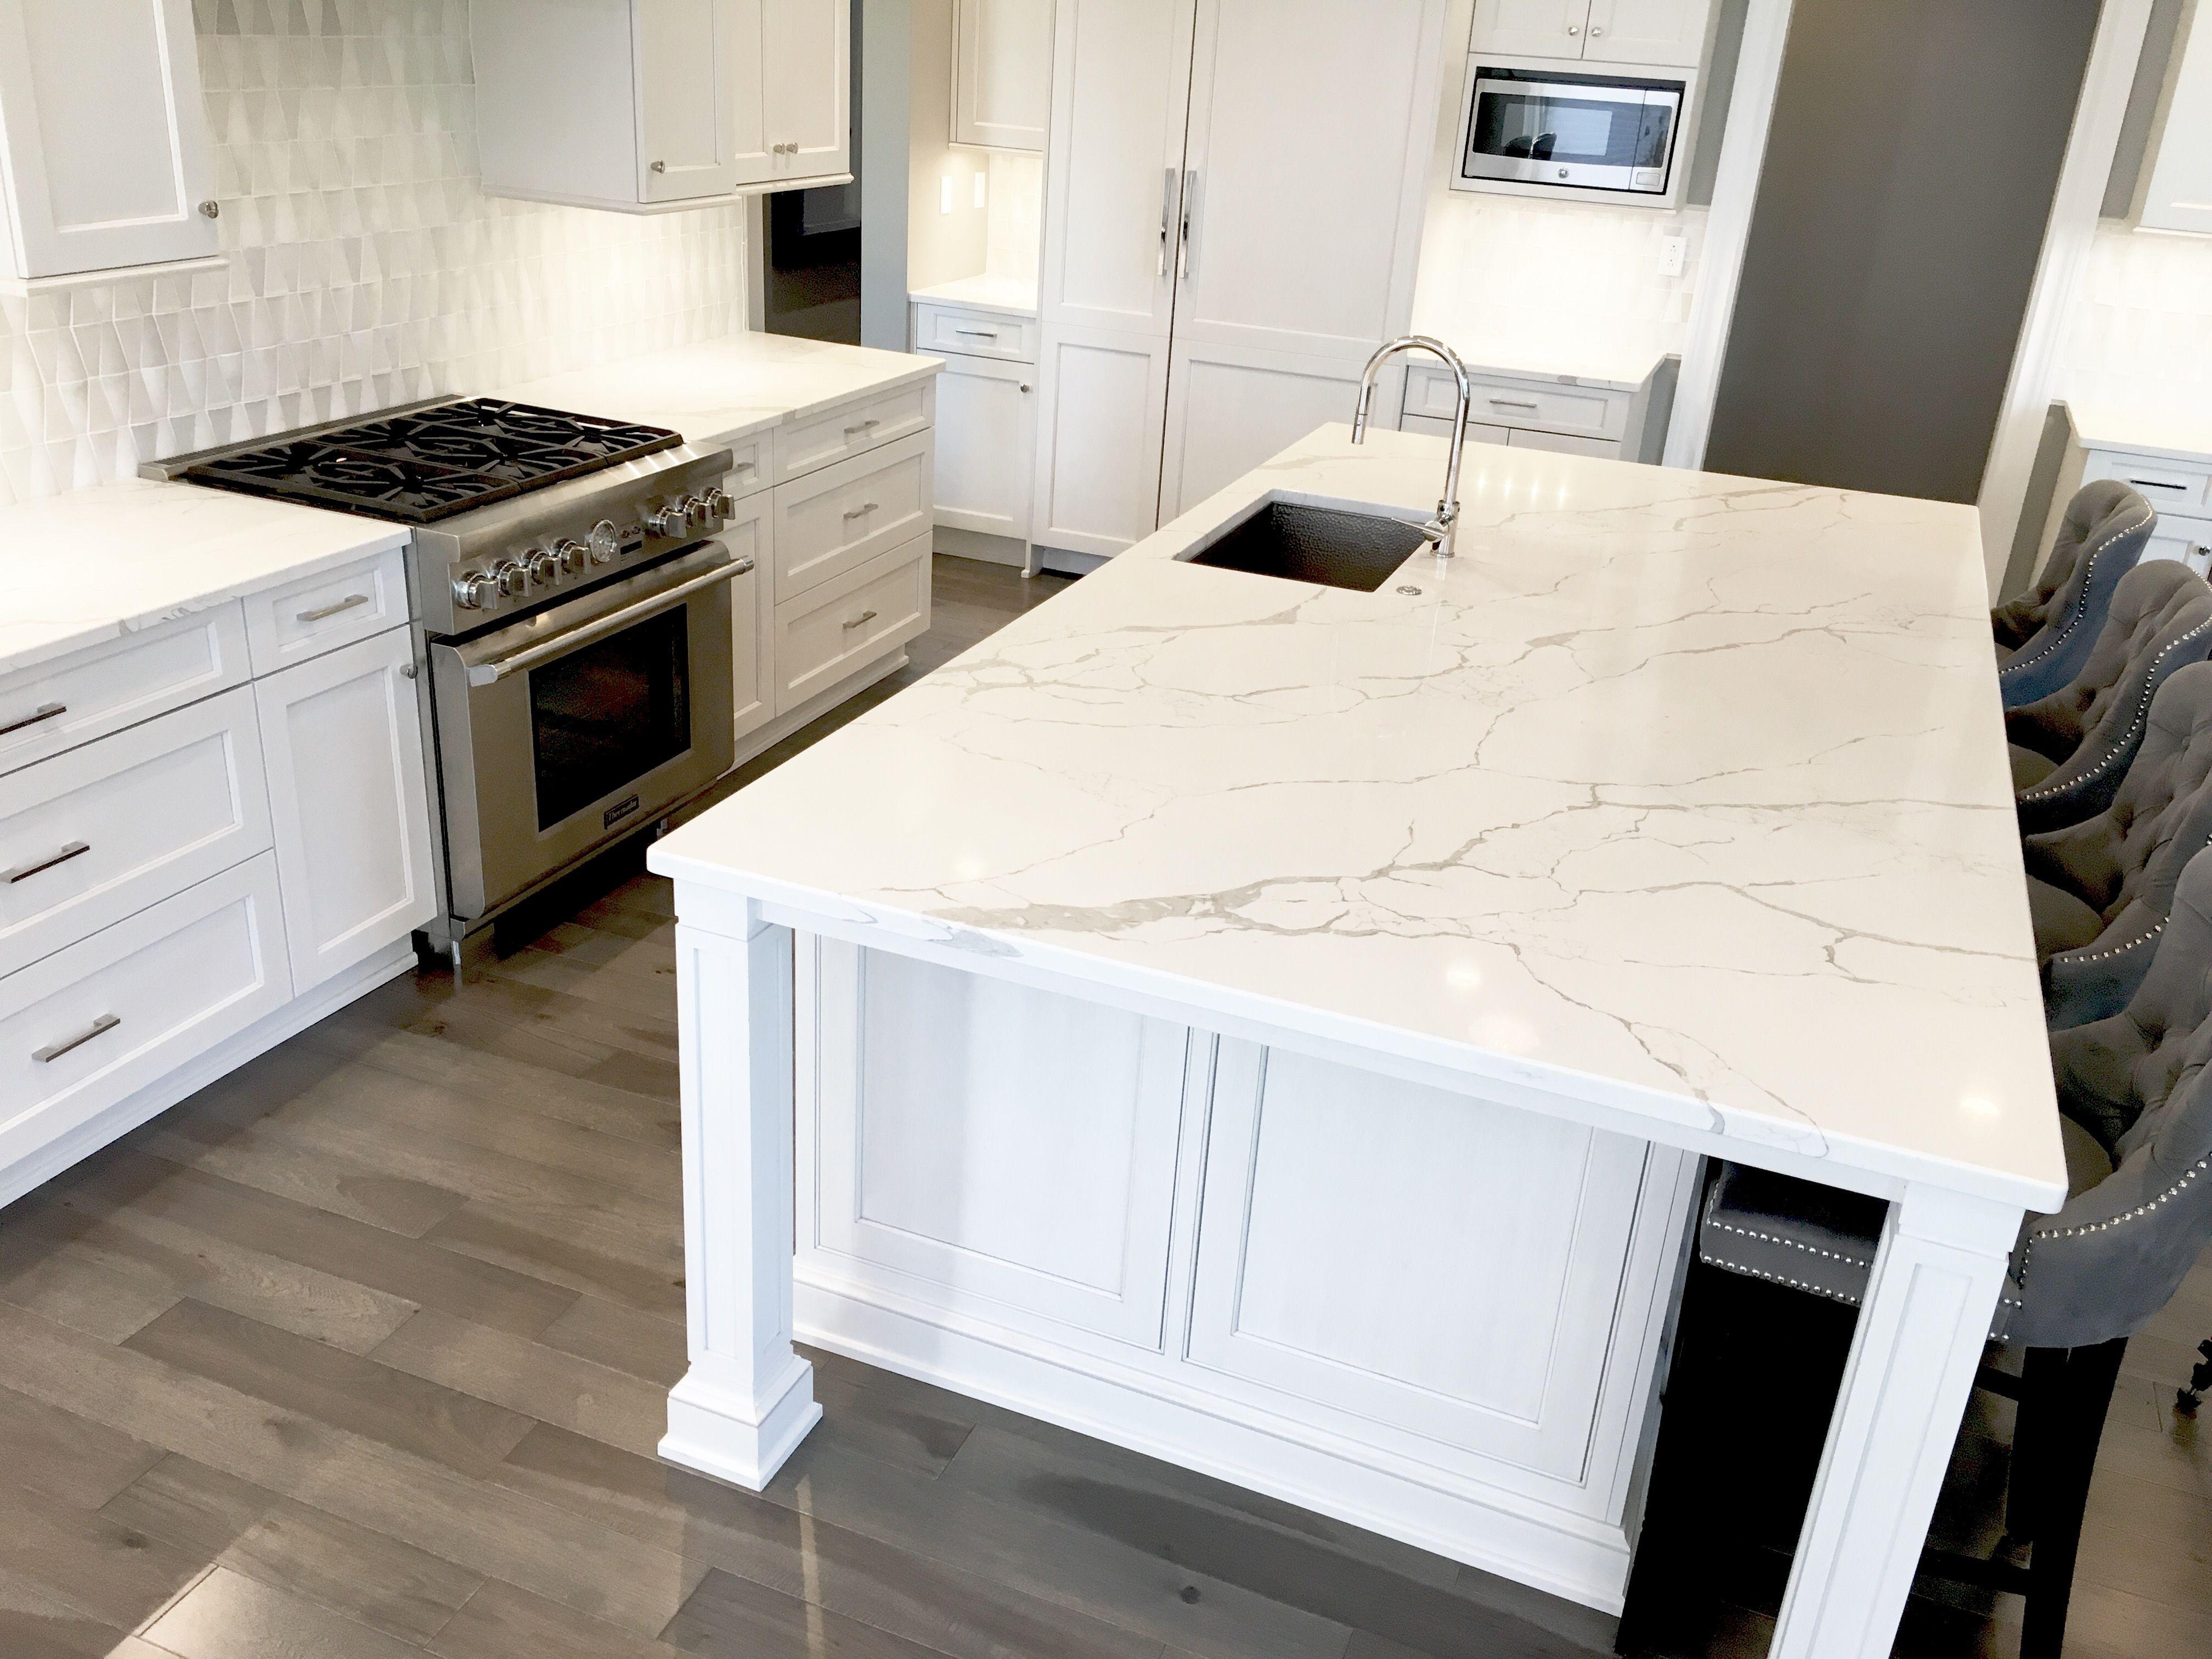 Rustic Glam Kitchen Design In Rochester Ny Concept Ii Quartz Kitchen Countertops White Kitchen Design Countertops